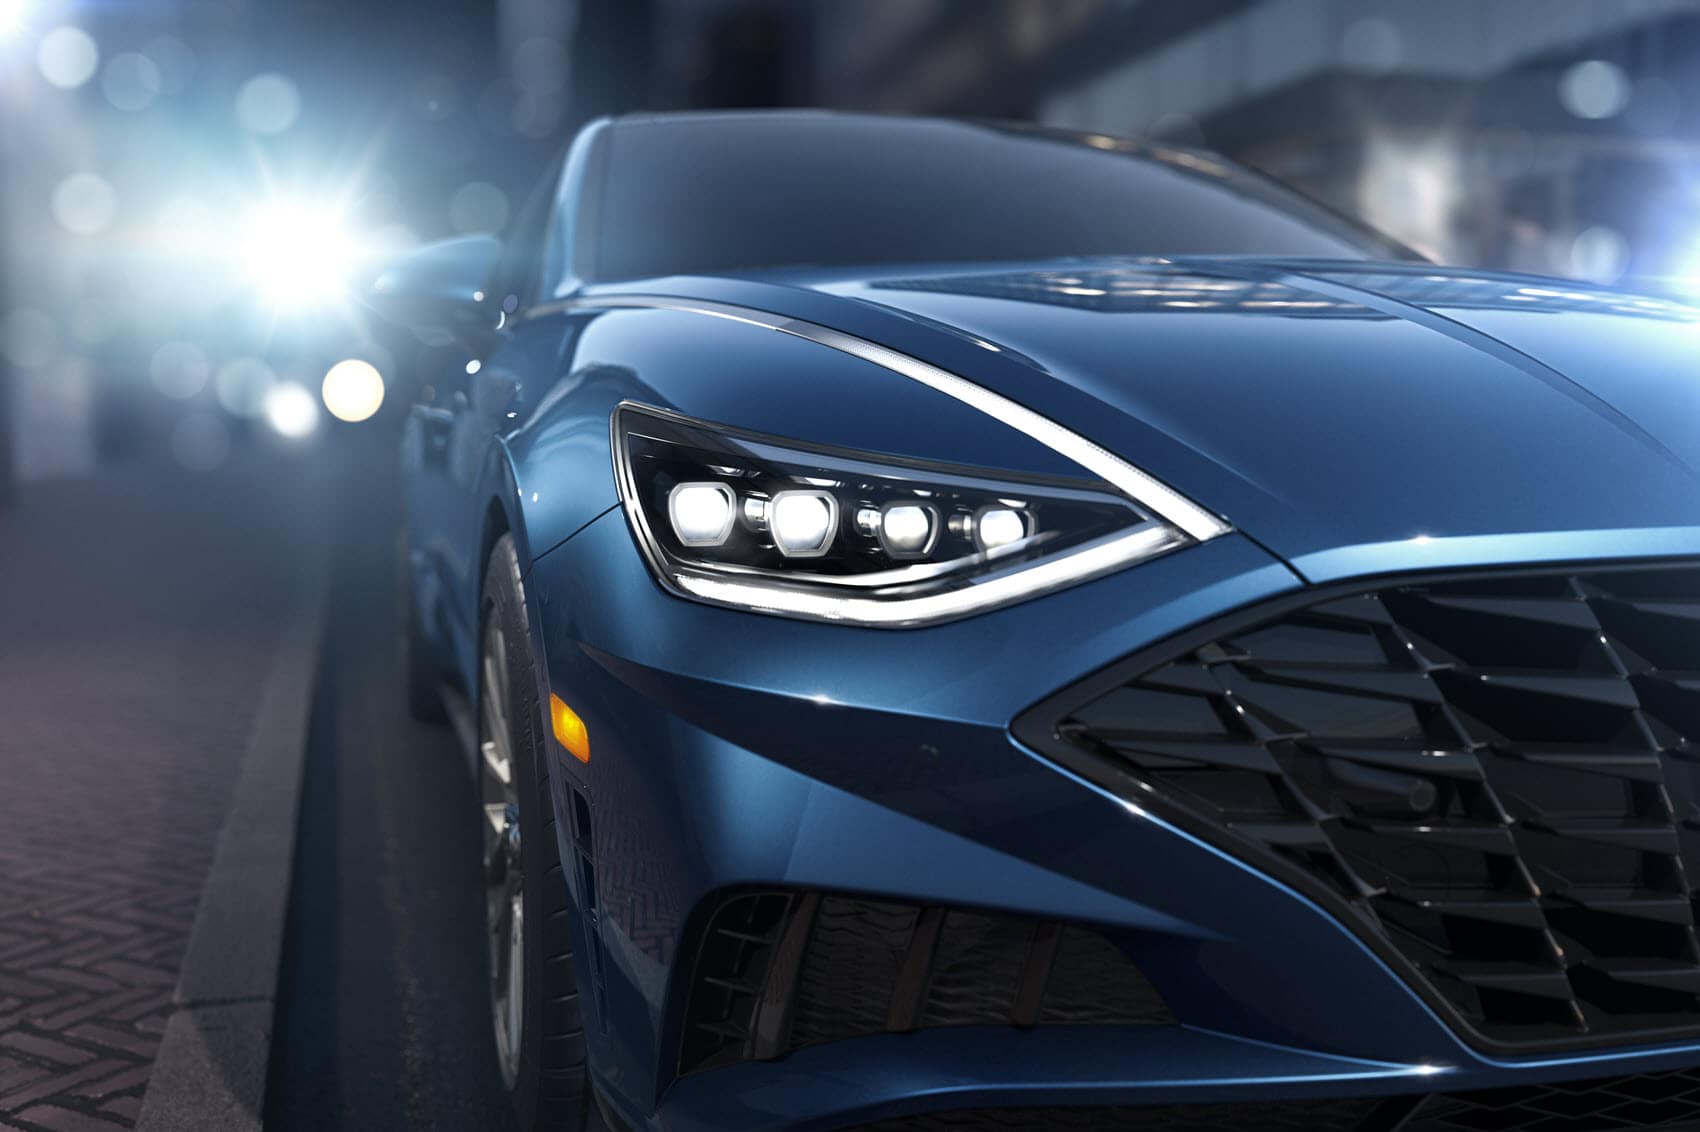 Hyundai Sonata Engine Specs